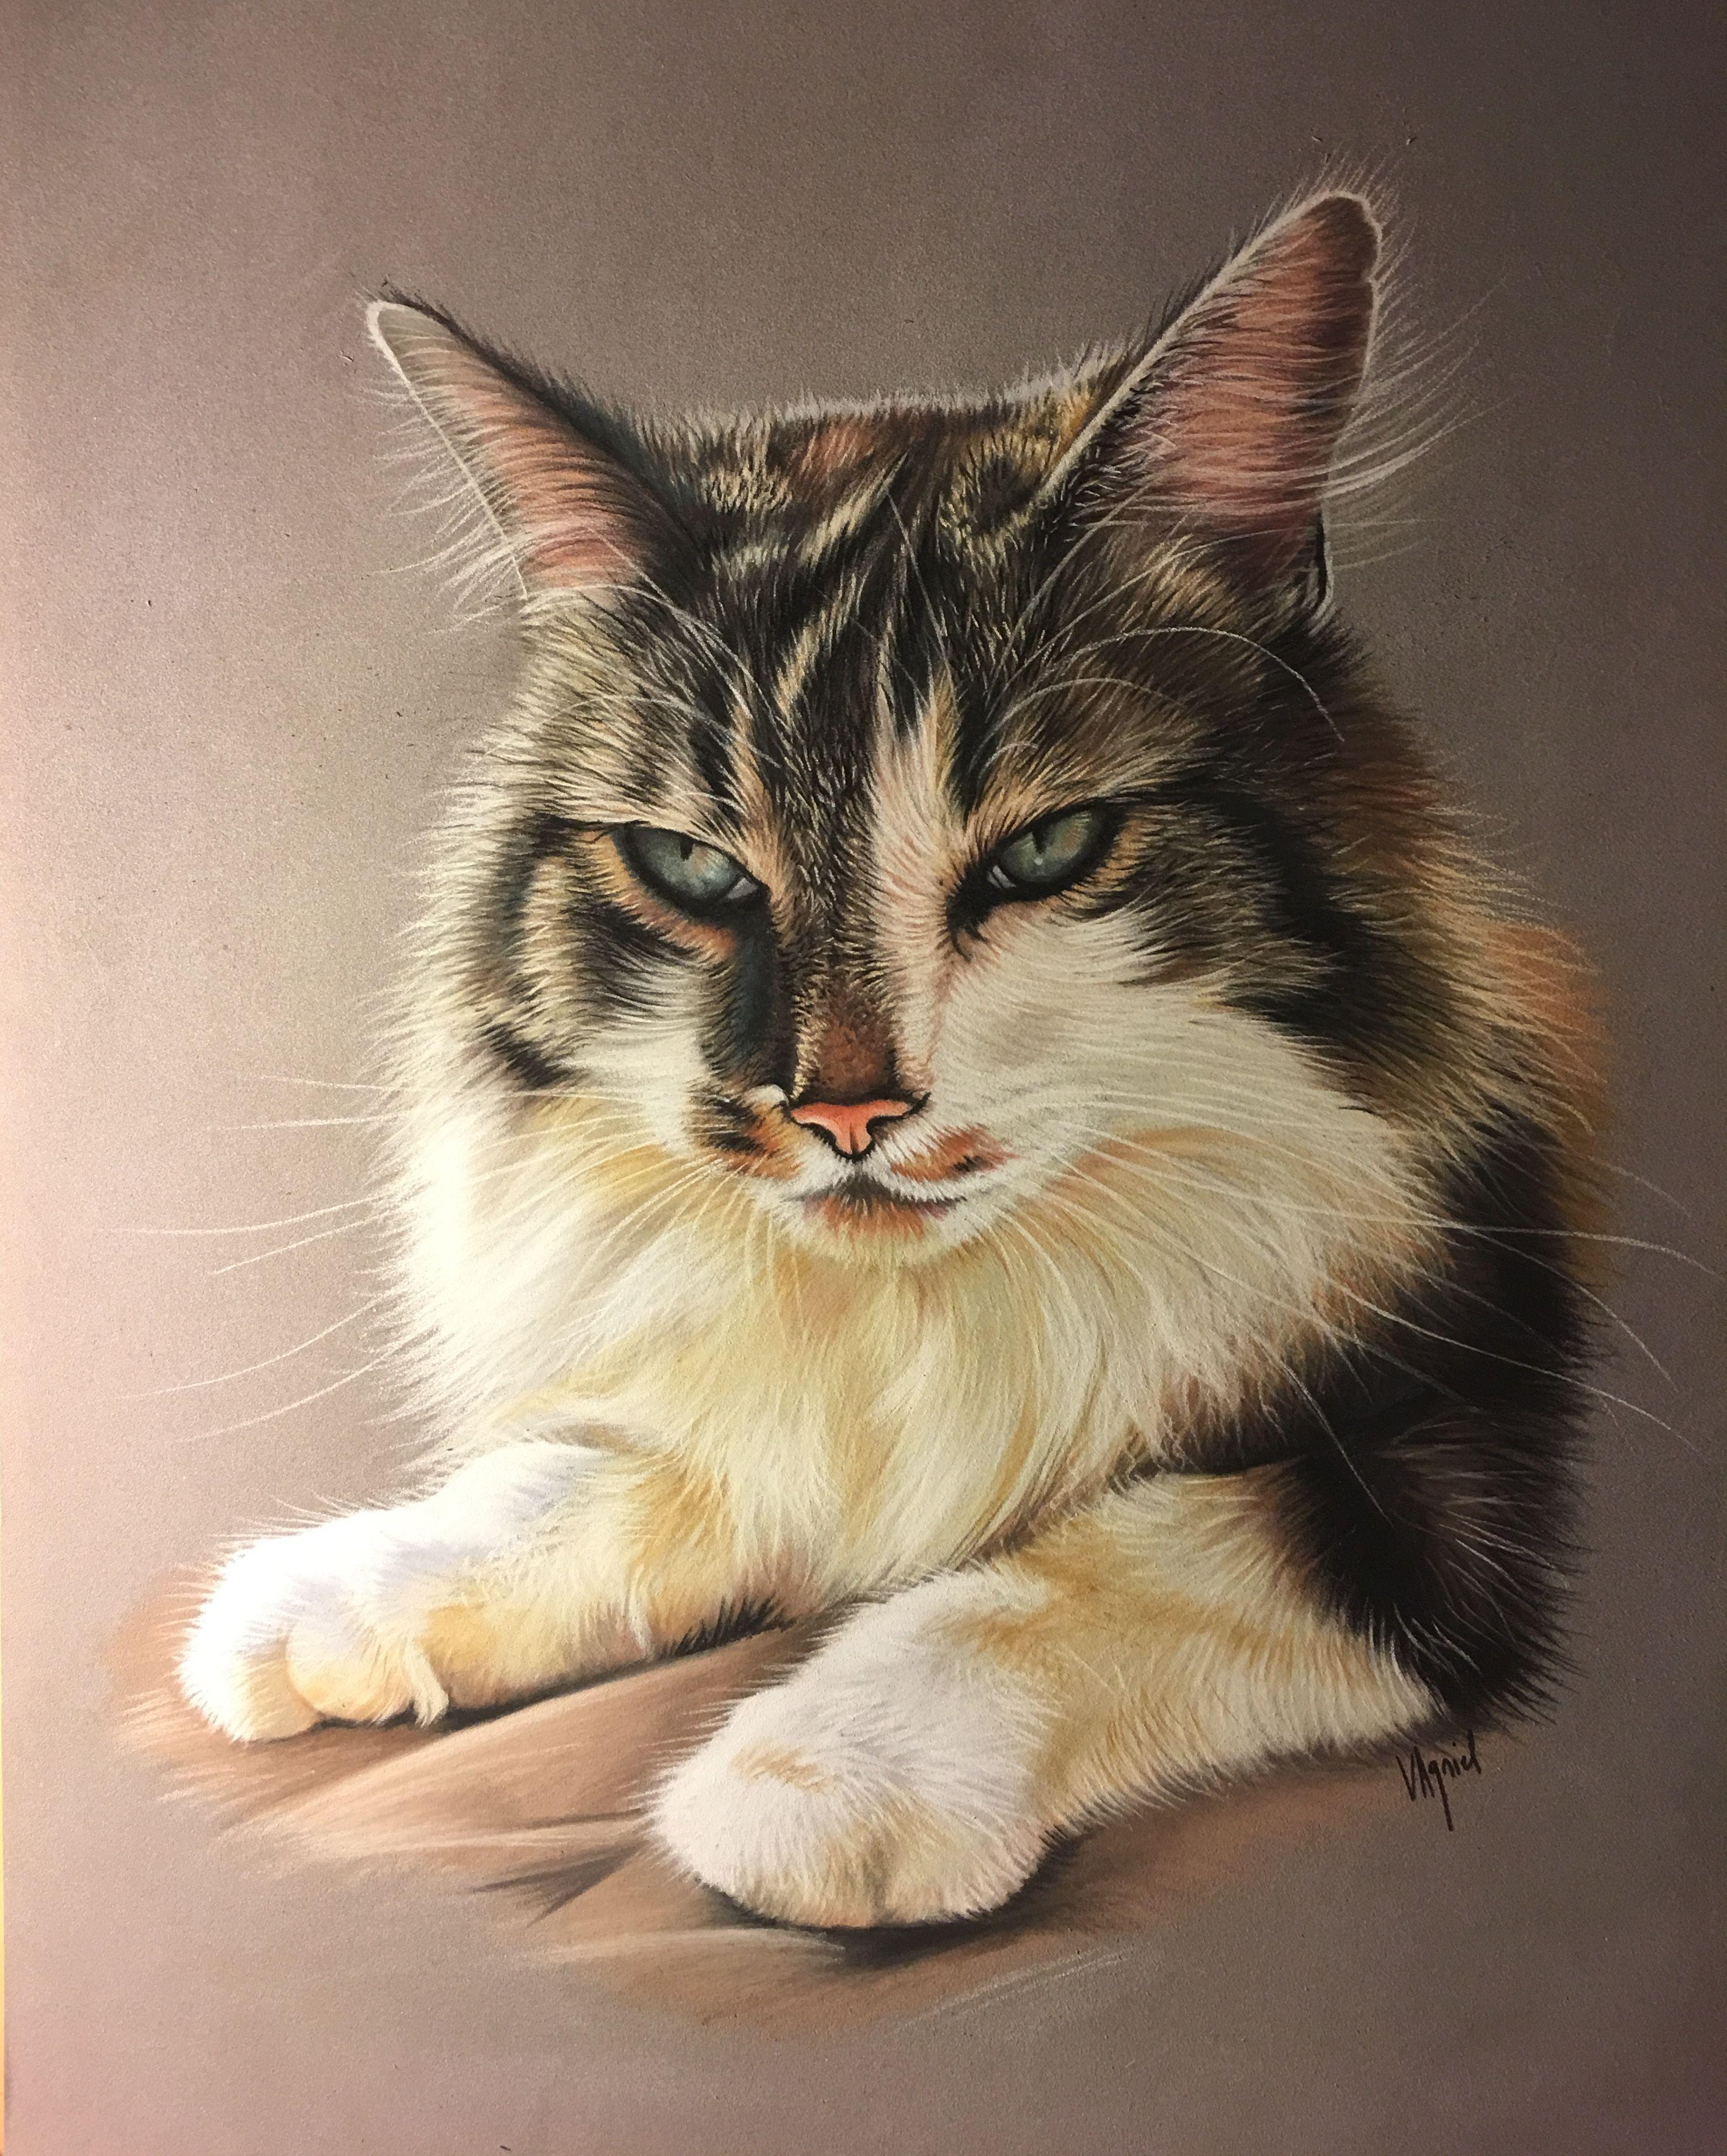 Chat Tigre Et Blanc Tiger Cat Pastel Dessin En 30 Par 40 Cm Art Animalier Artiste Animalier Dessin Animalier Artanimalier C Chat Tigre Dessin Chat Animaux